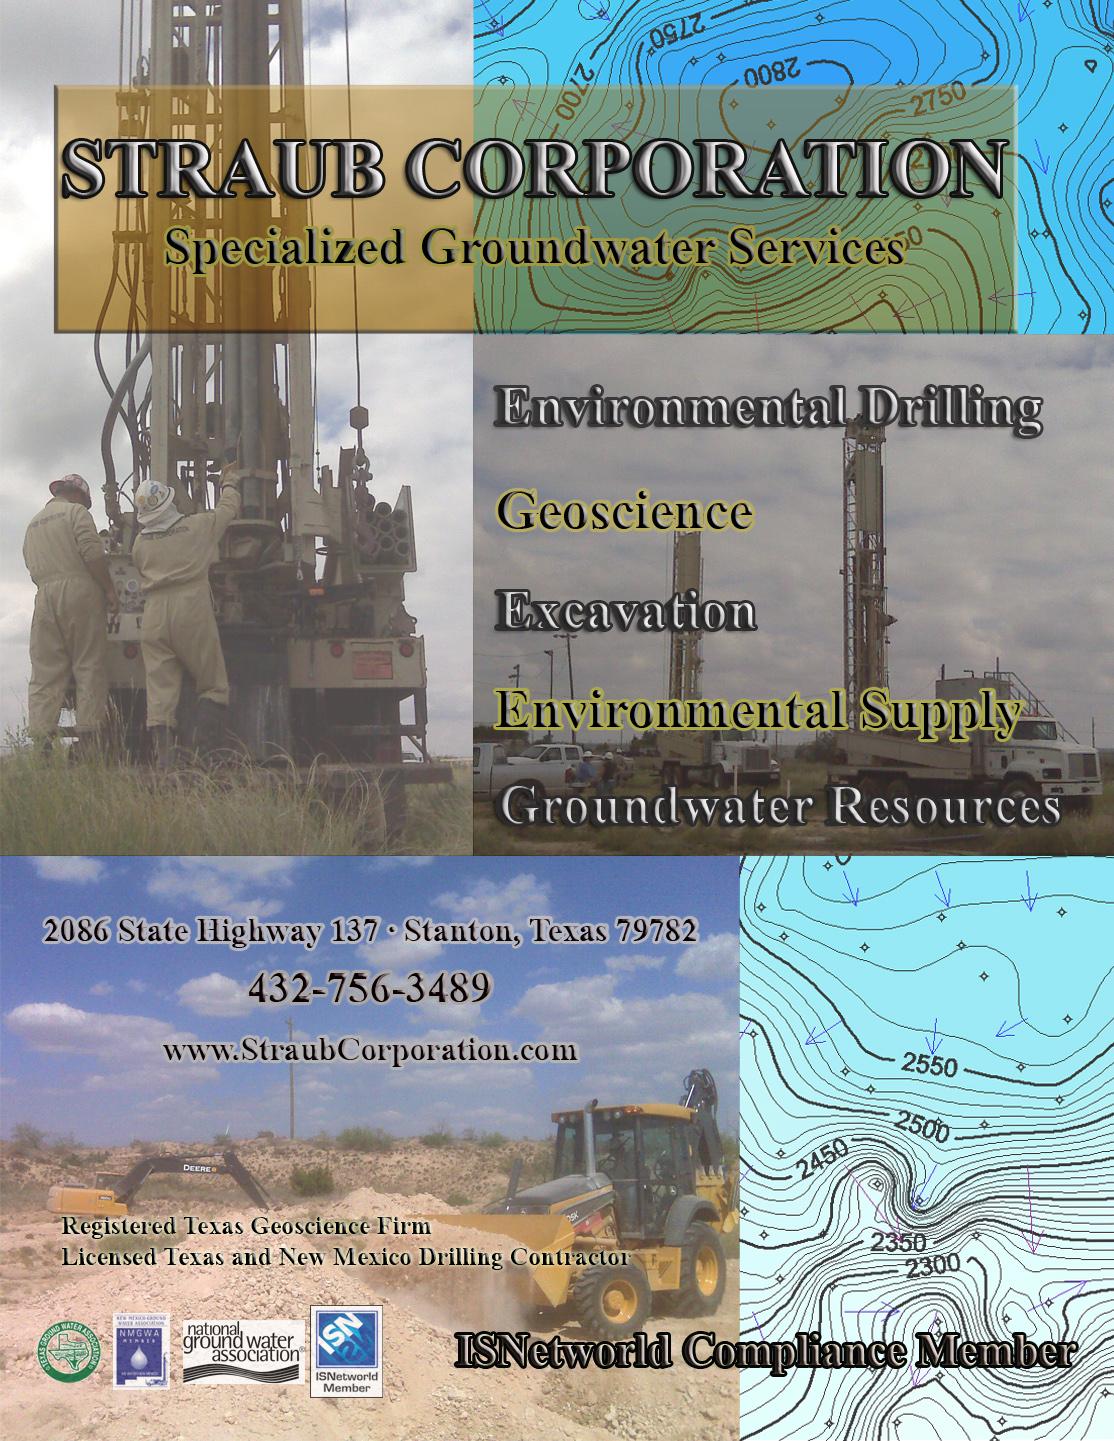 straubcorp cover 9-2012.jpg